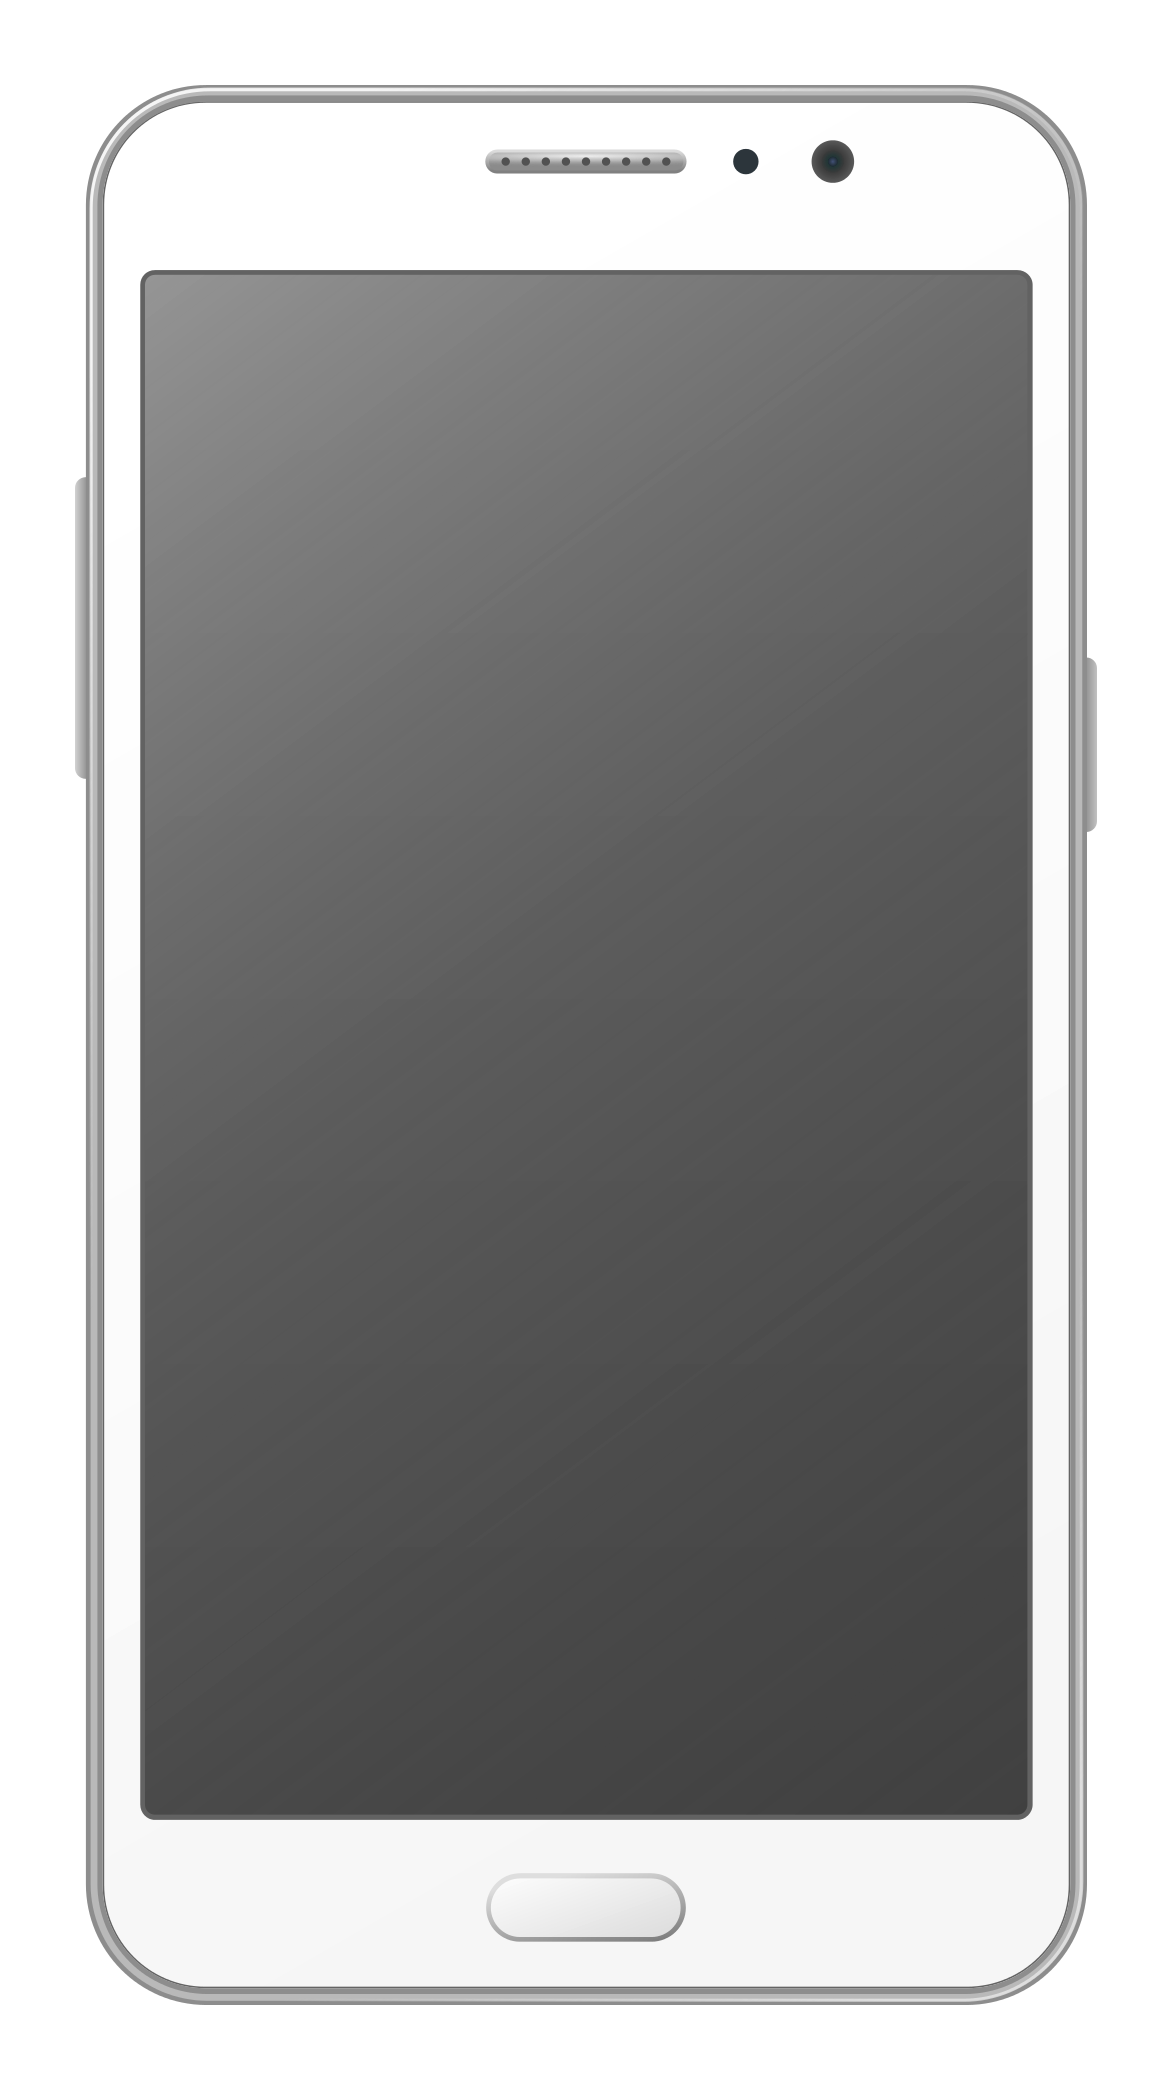 Electronics clipart vector. Smartphone png transparent image